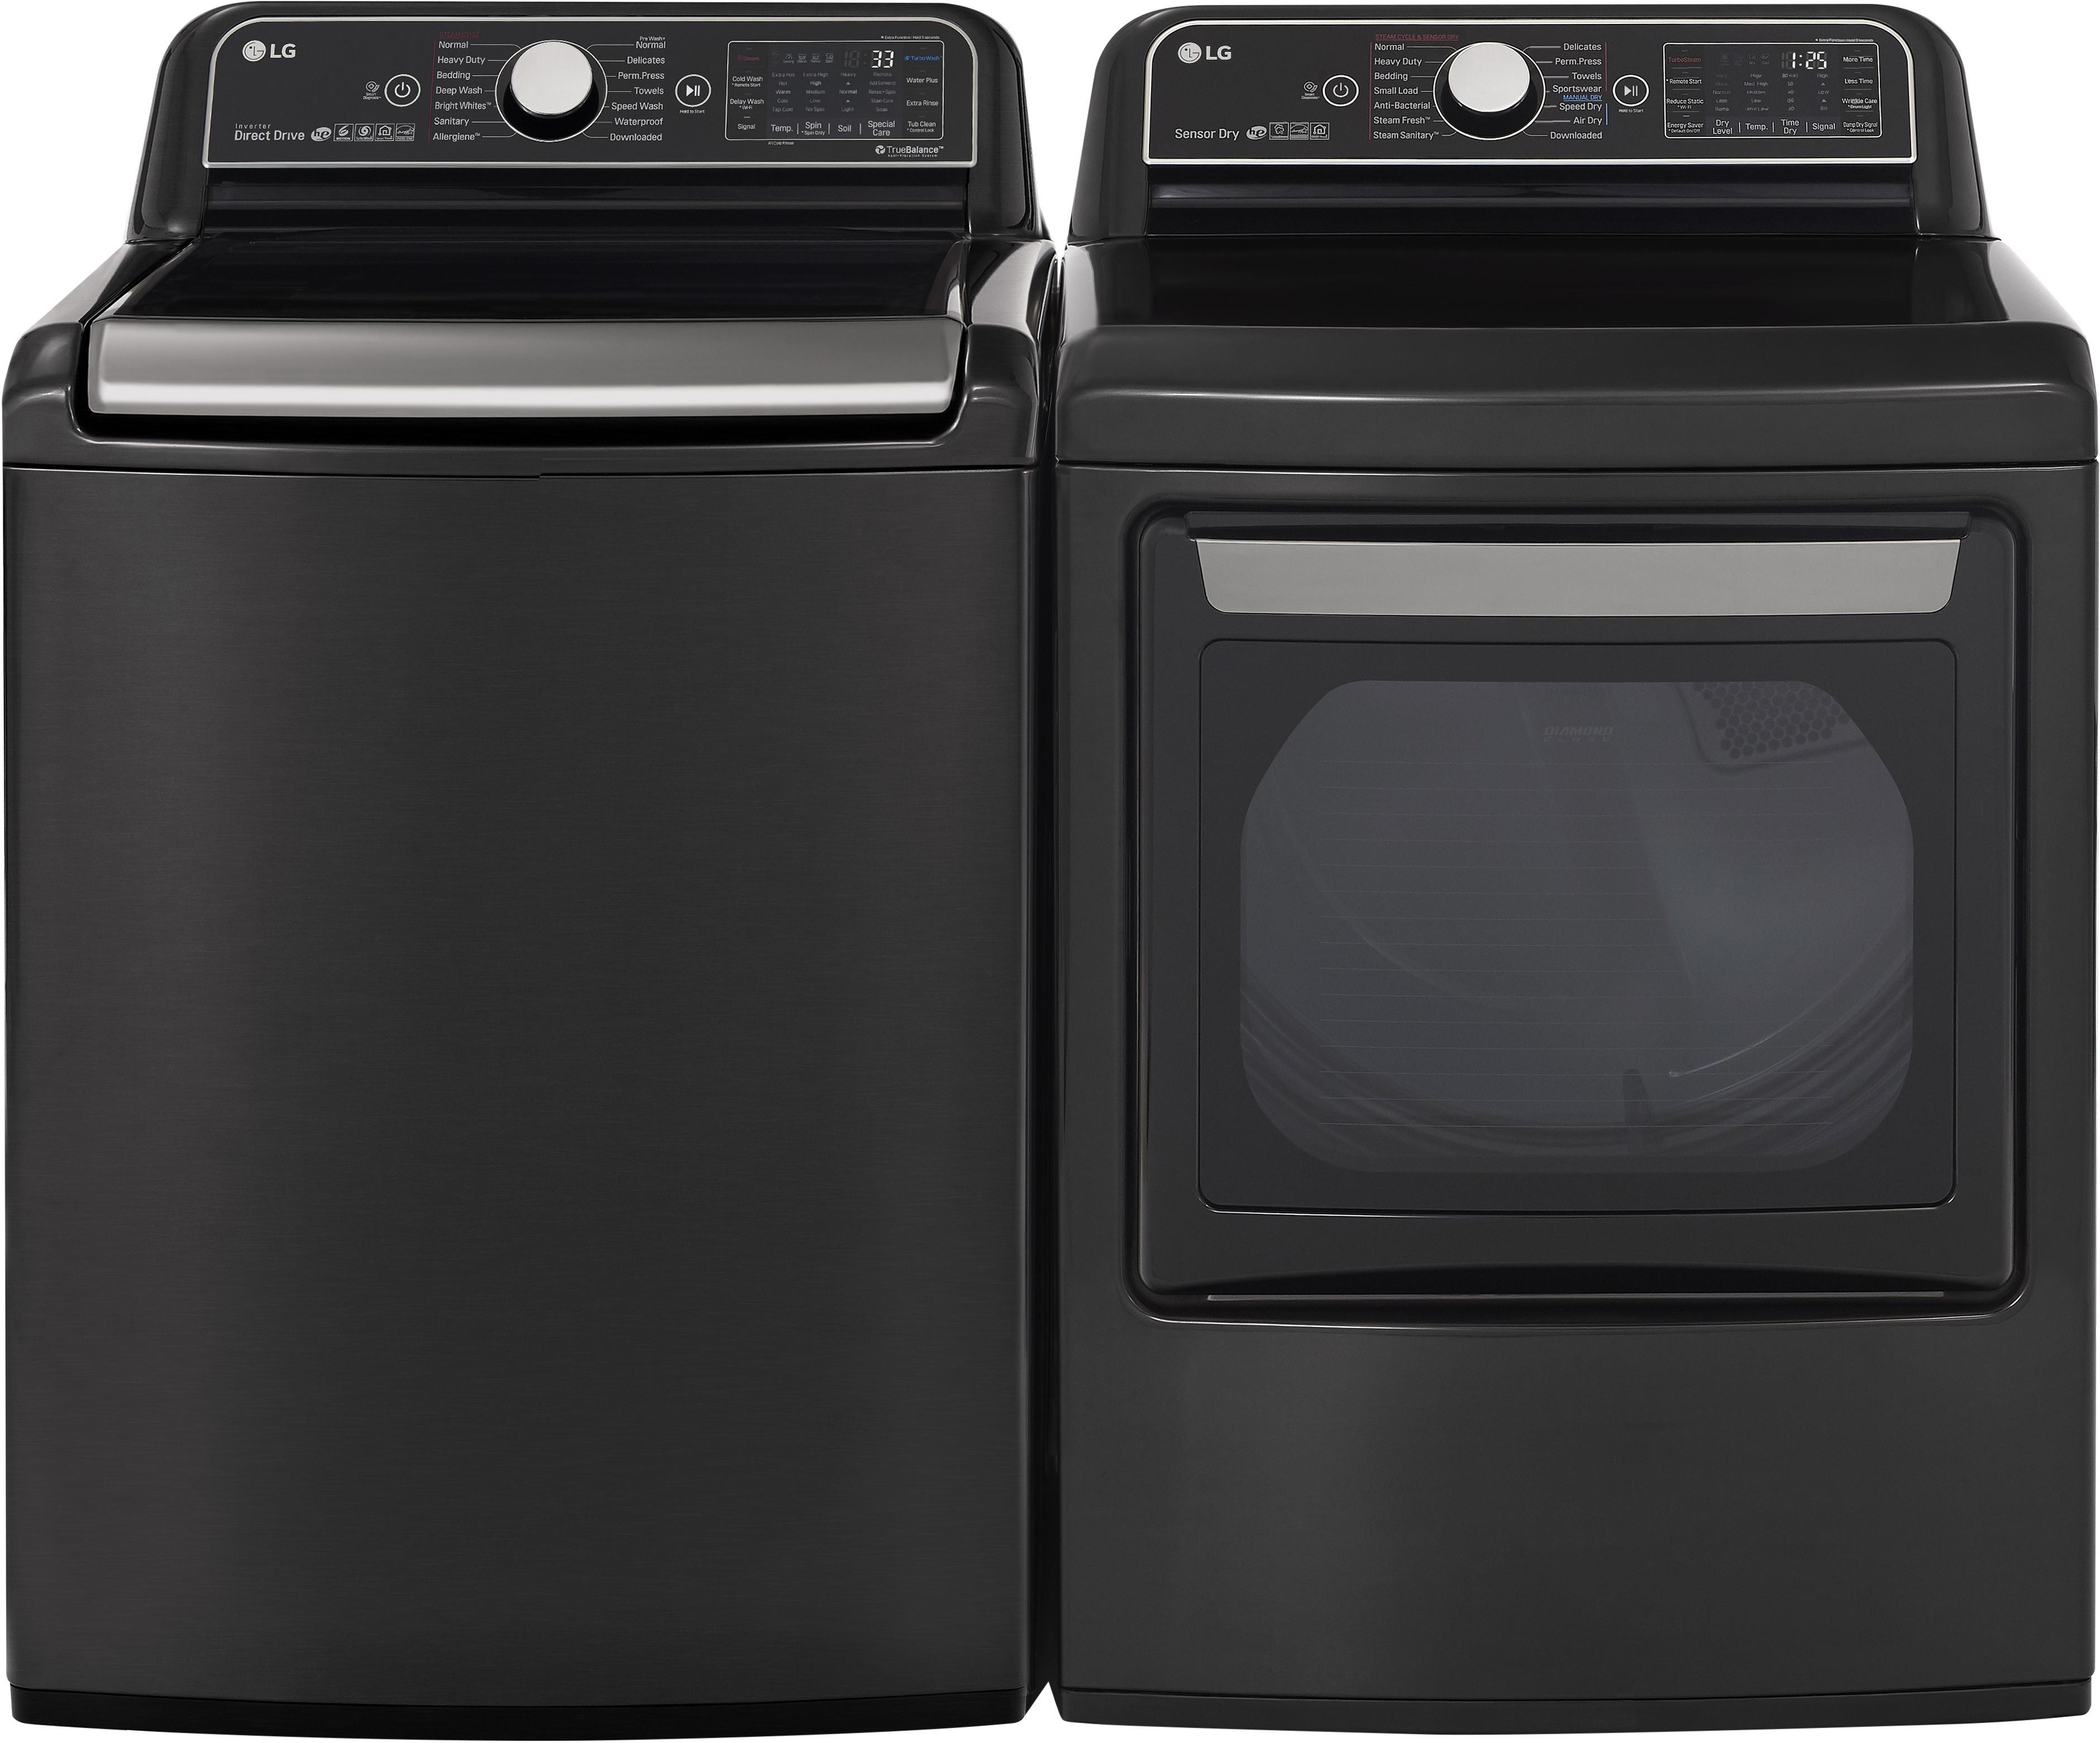 LG Side-by-Side Washer & Dryer Set